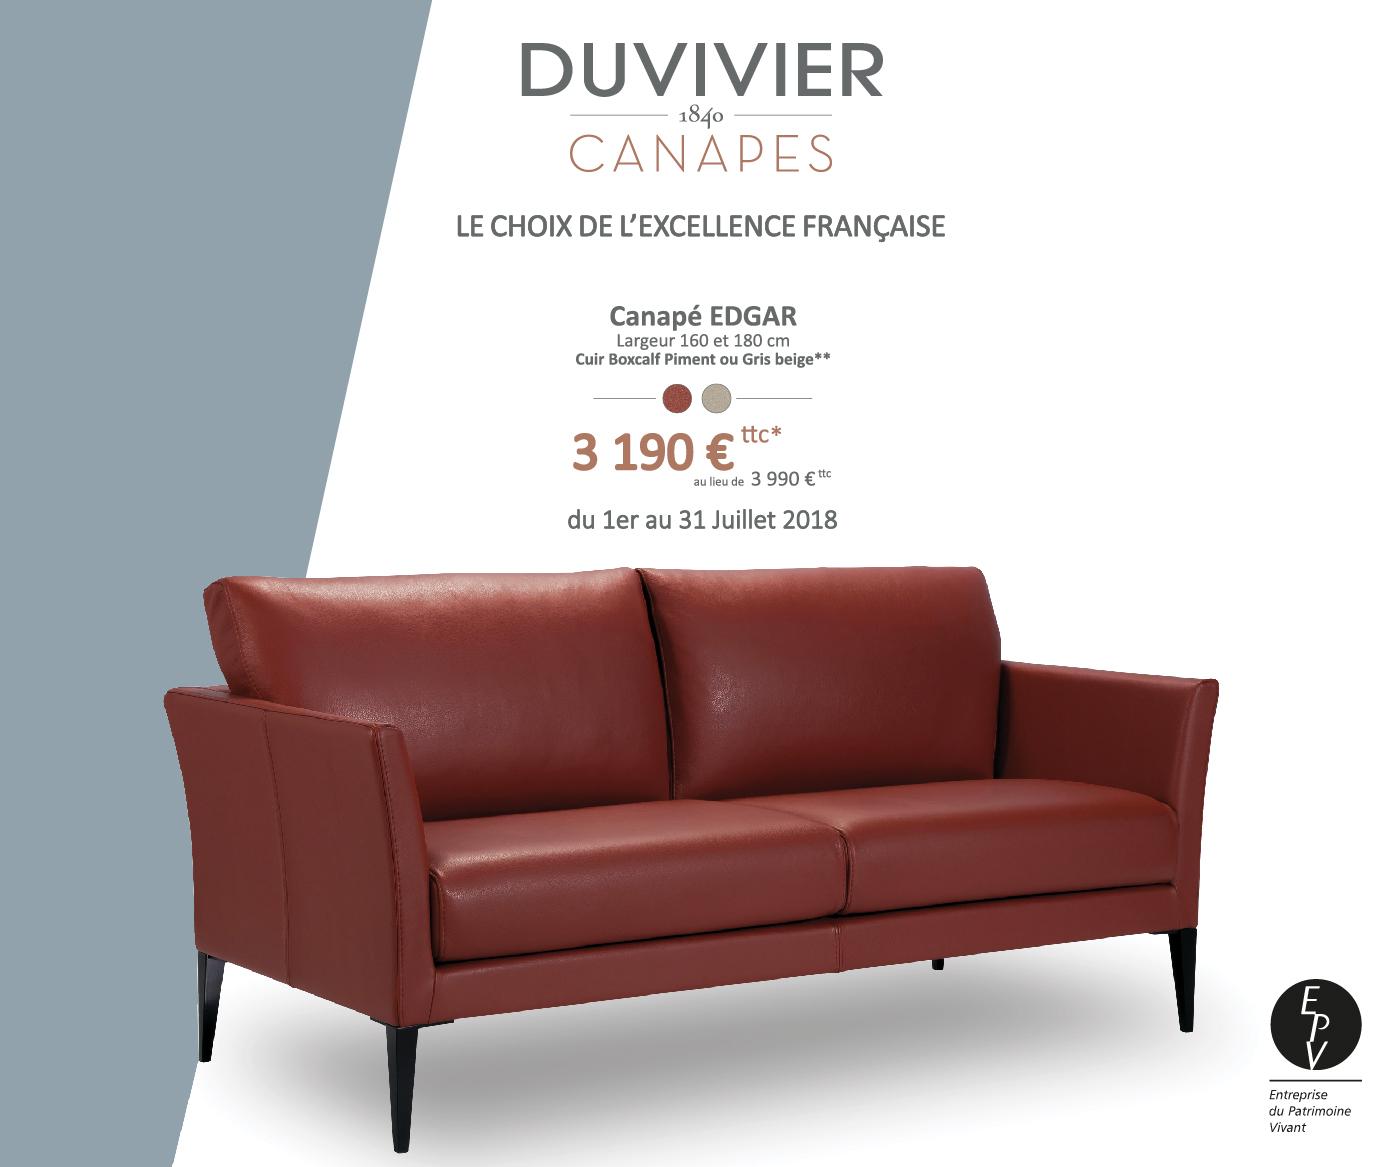 offre sp ciale edgar duvivier canap s. Black Bedroom Furniture Sets. Home Design Ideas